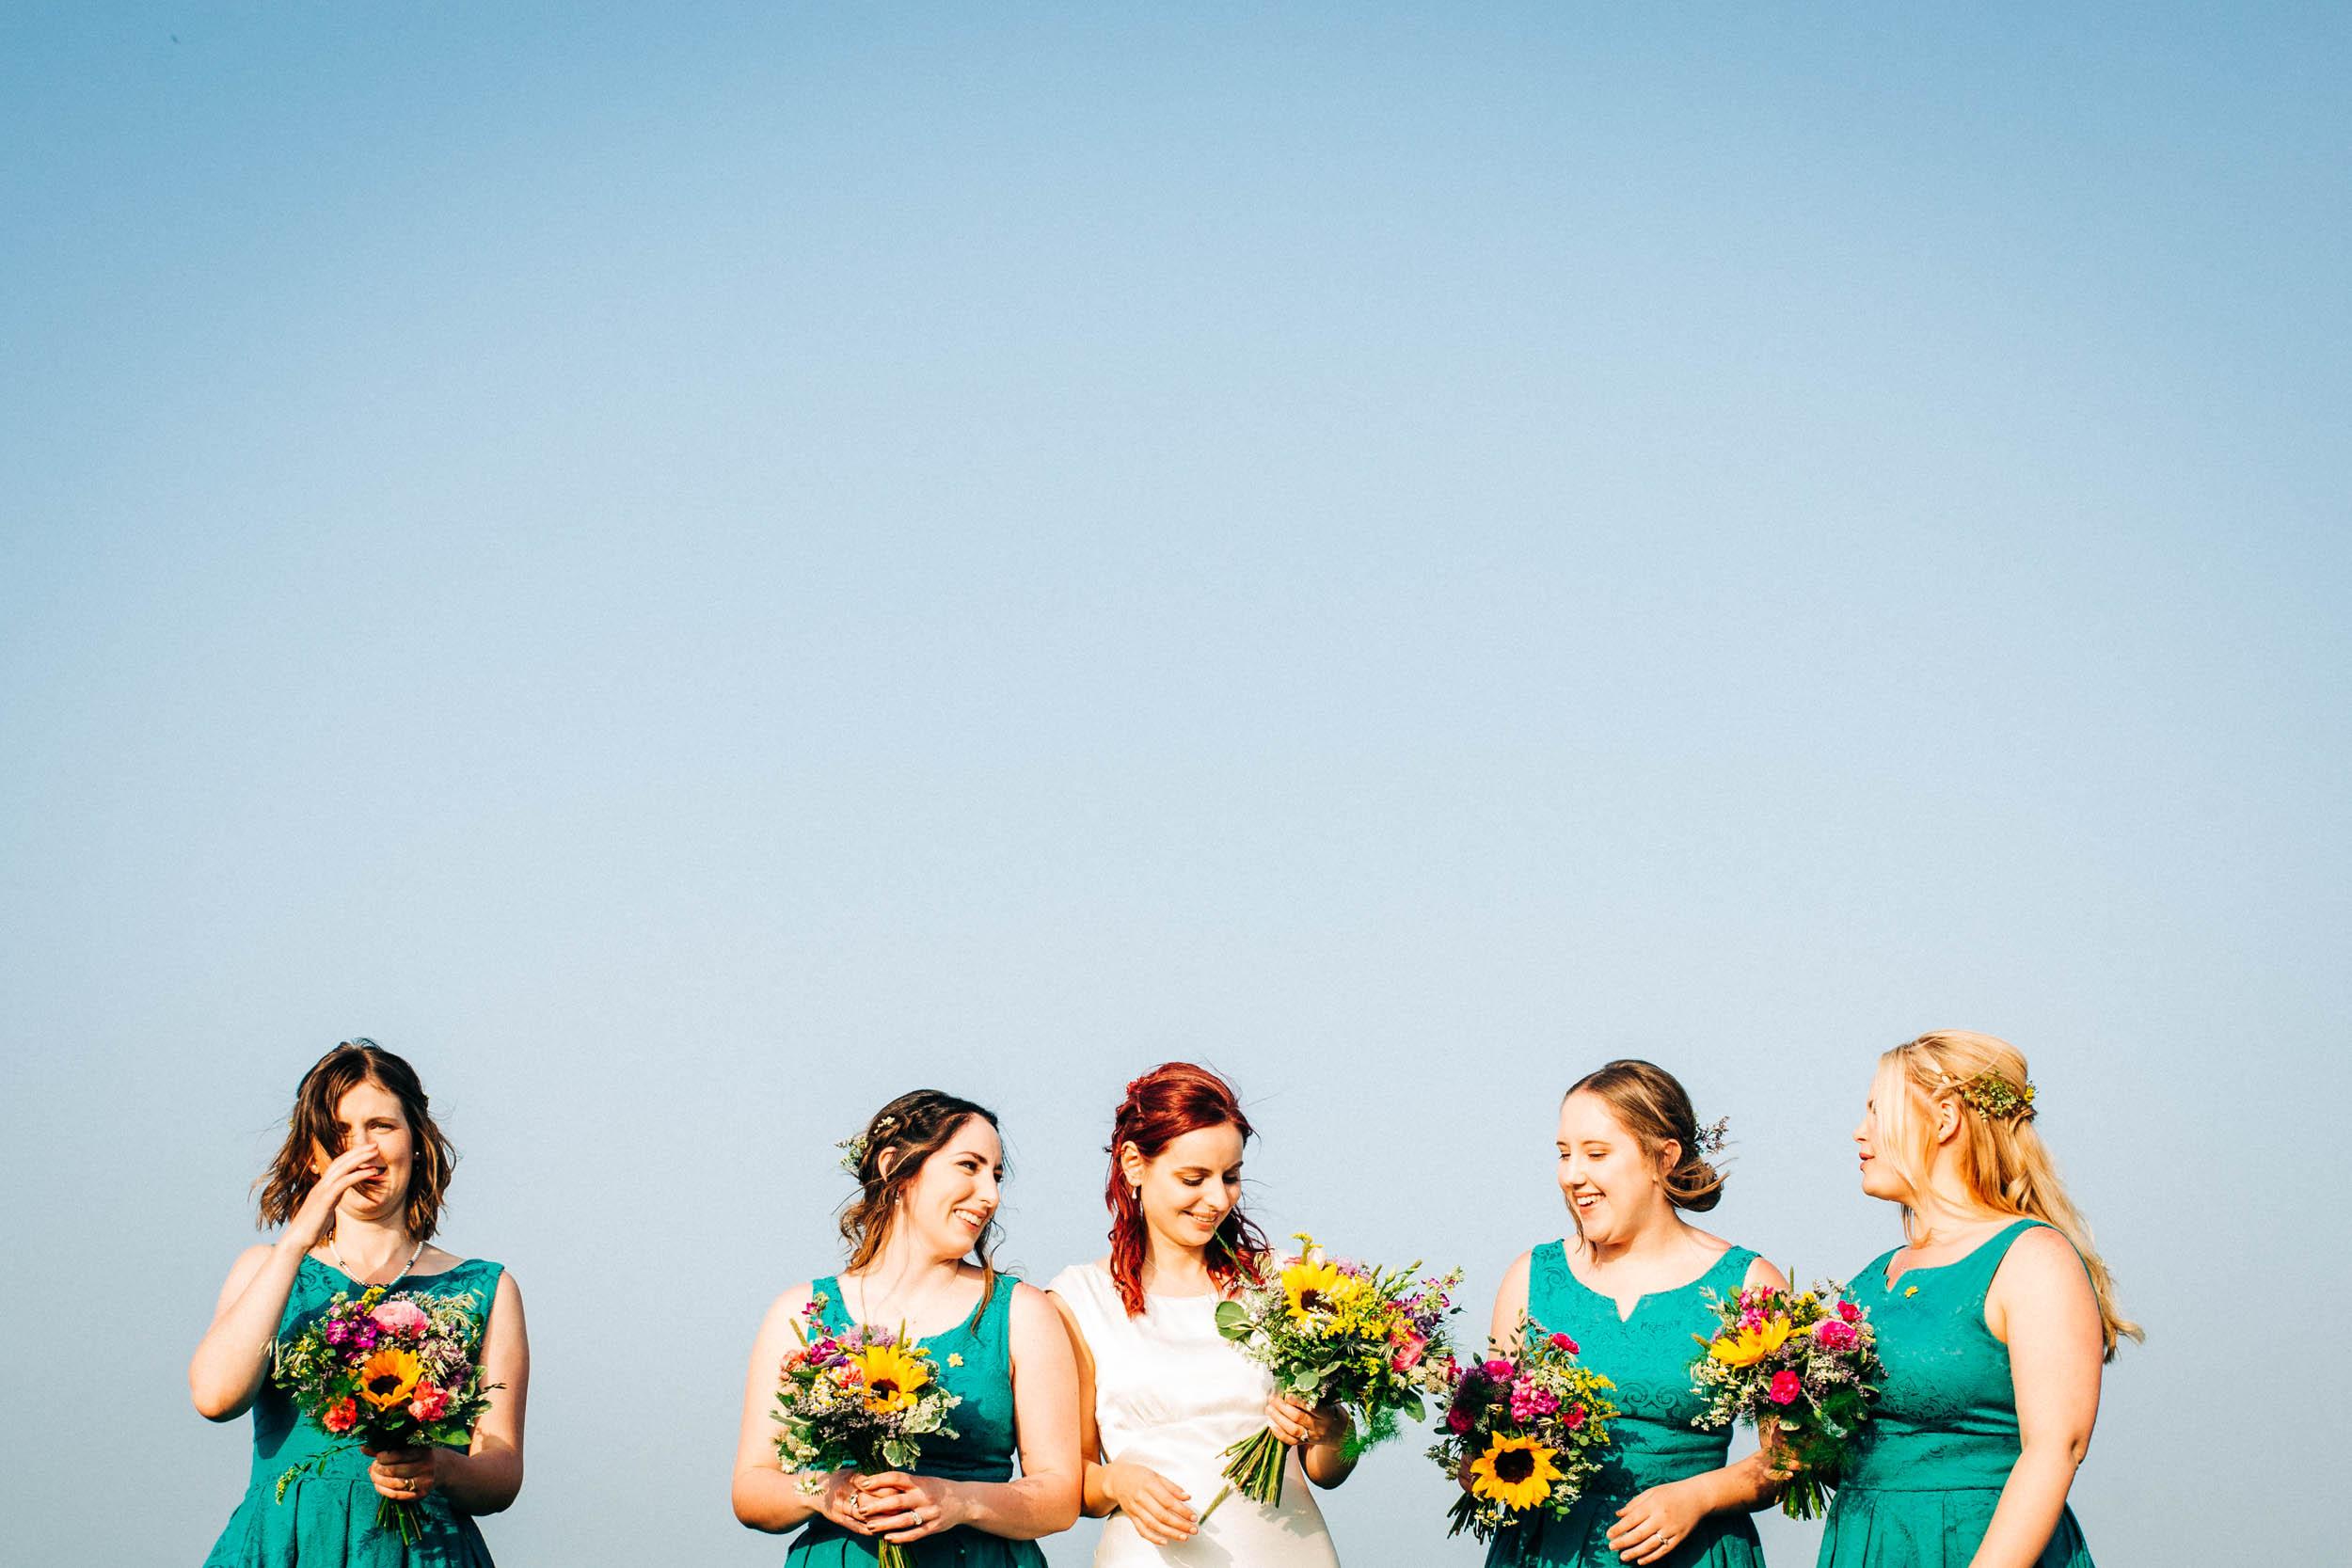 Alex_Sedgmond_Photography-SouthWalesWeddingPhotography-Wedding-Photographer-Cardiff-142.jpg